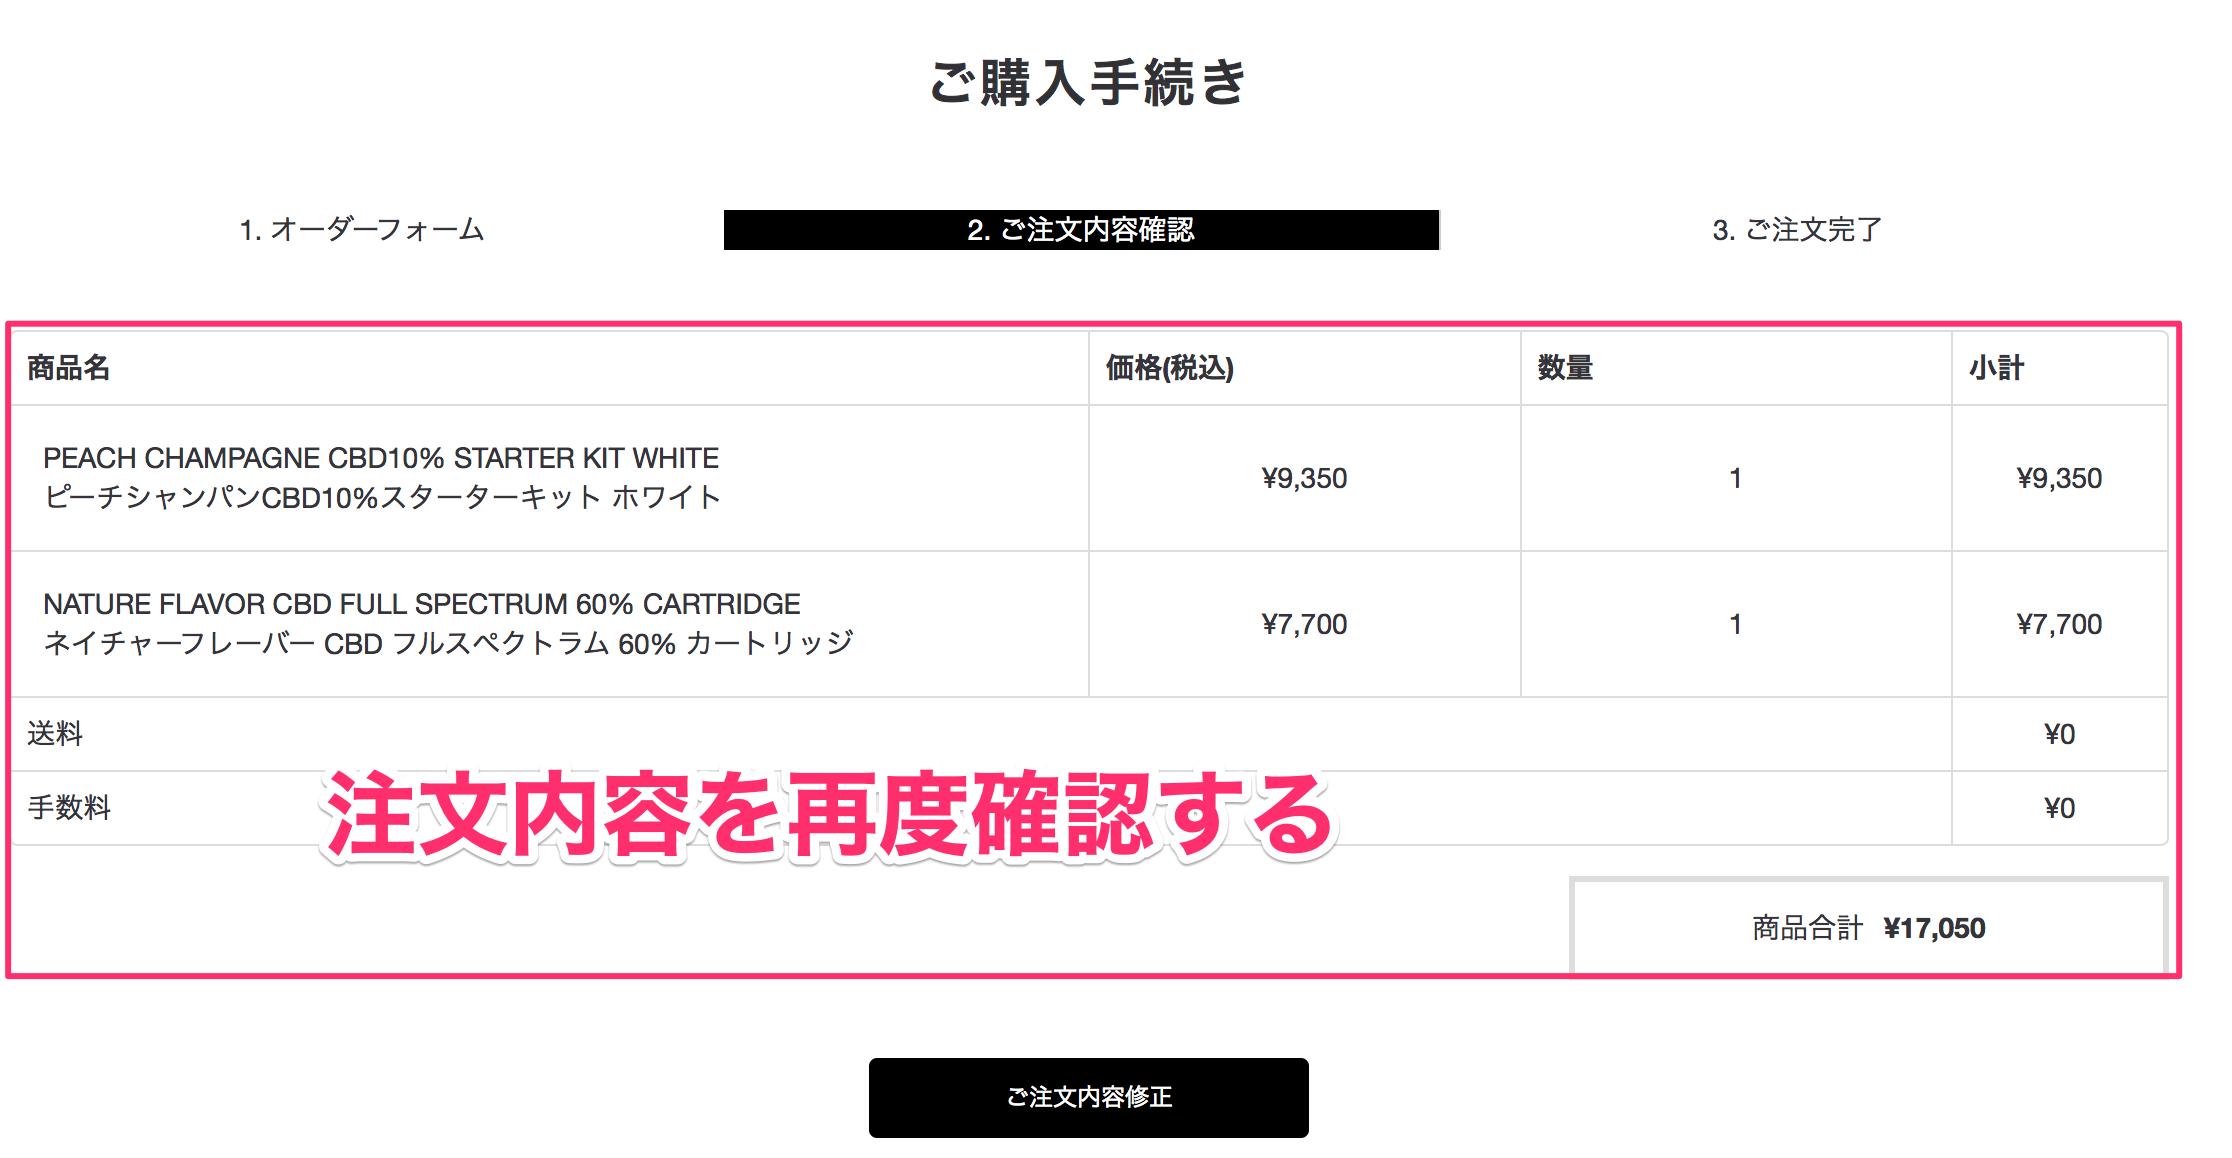 注文内容の確認